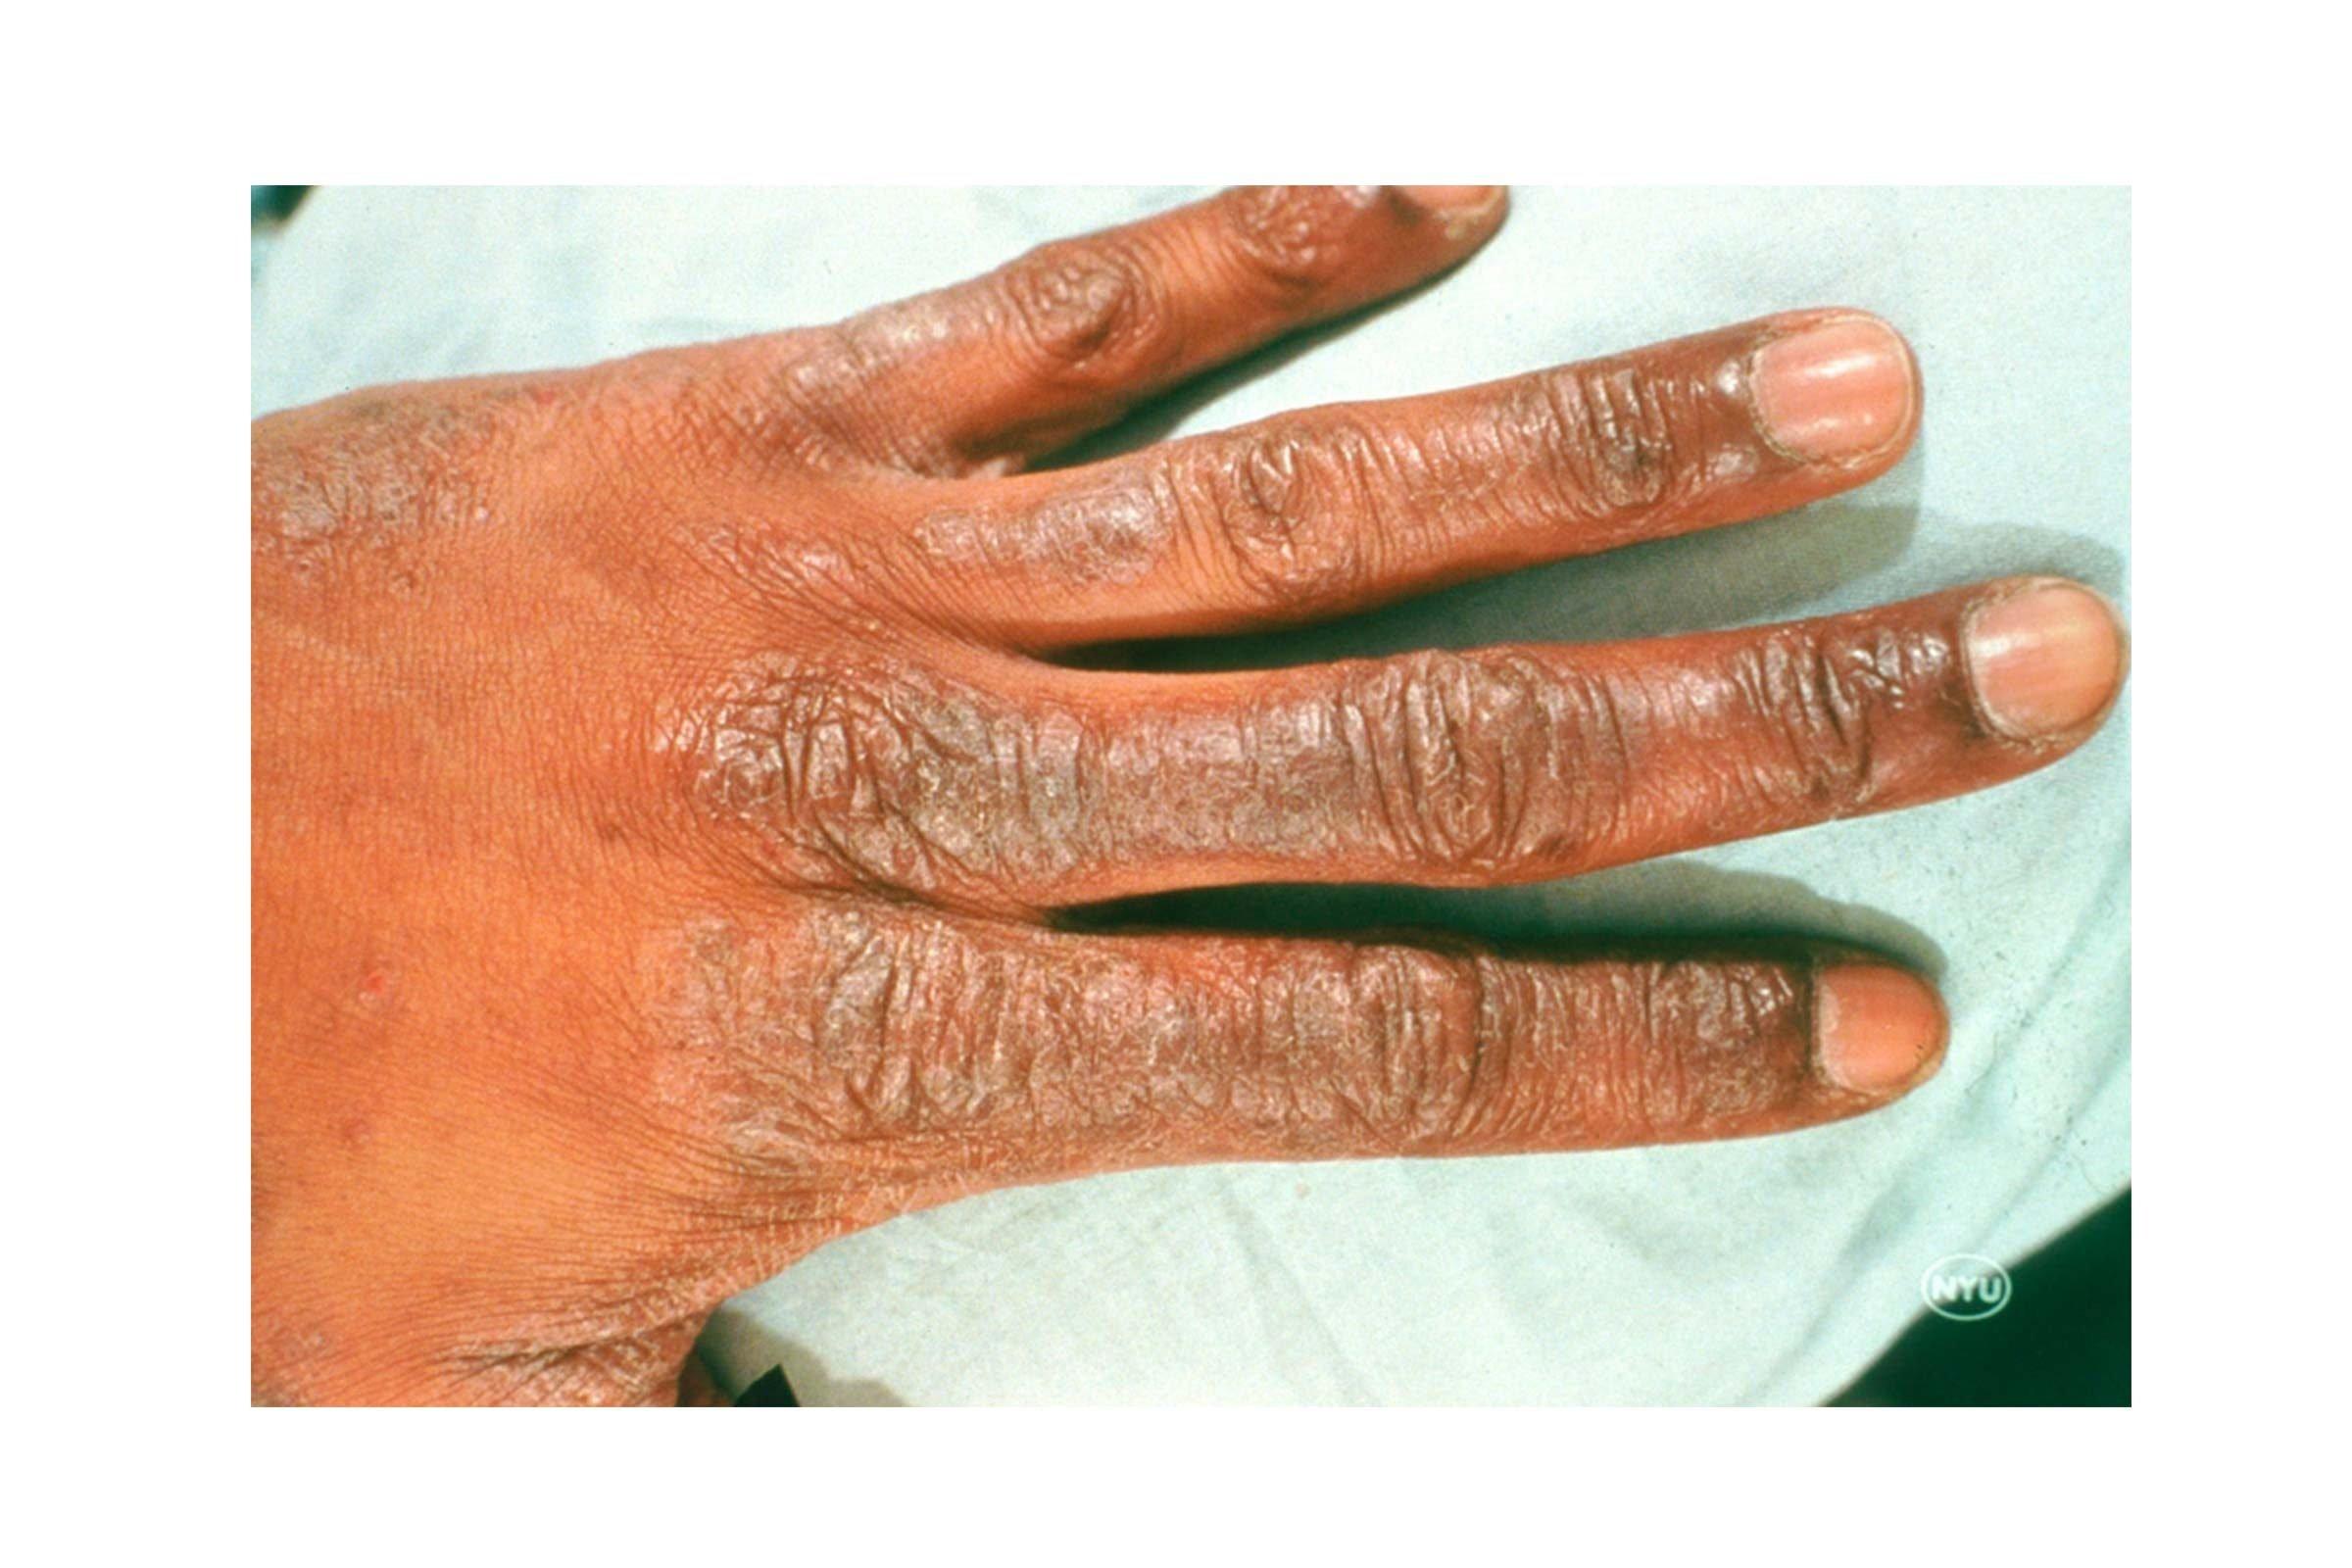 What S That Rash How To Id Common Rash Symptoms Reader